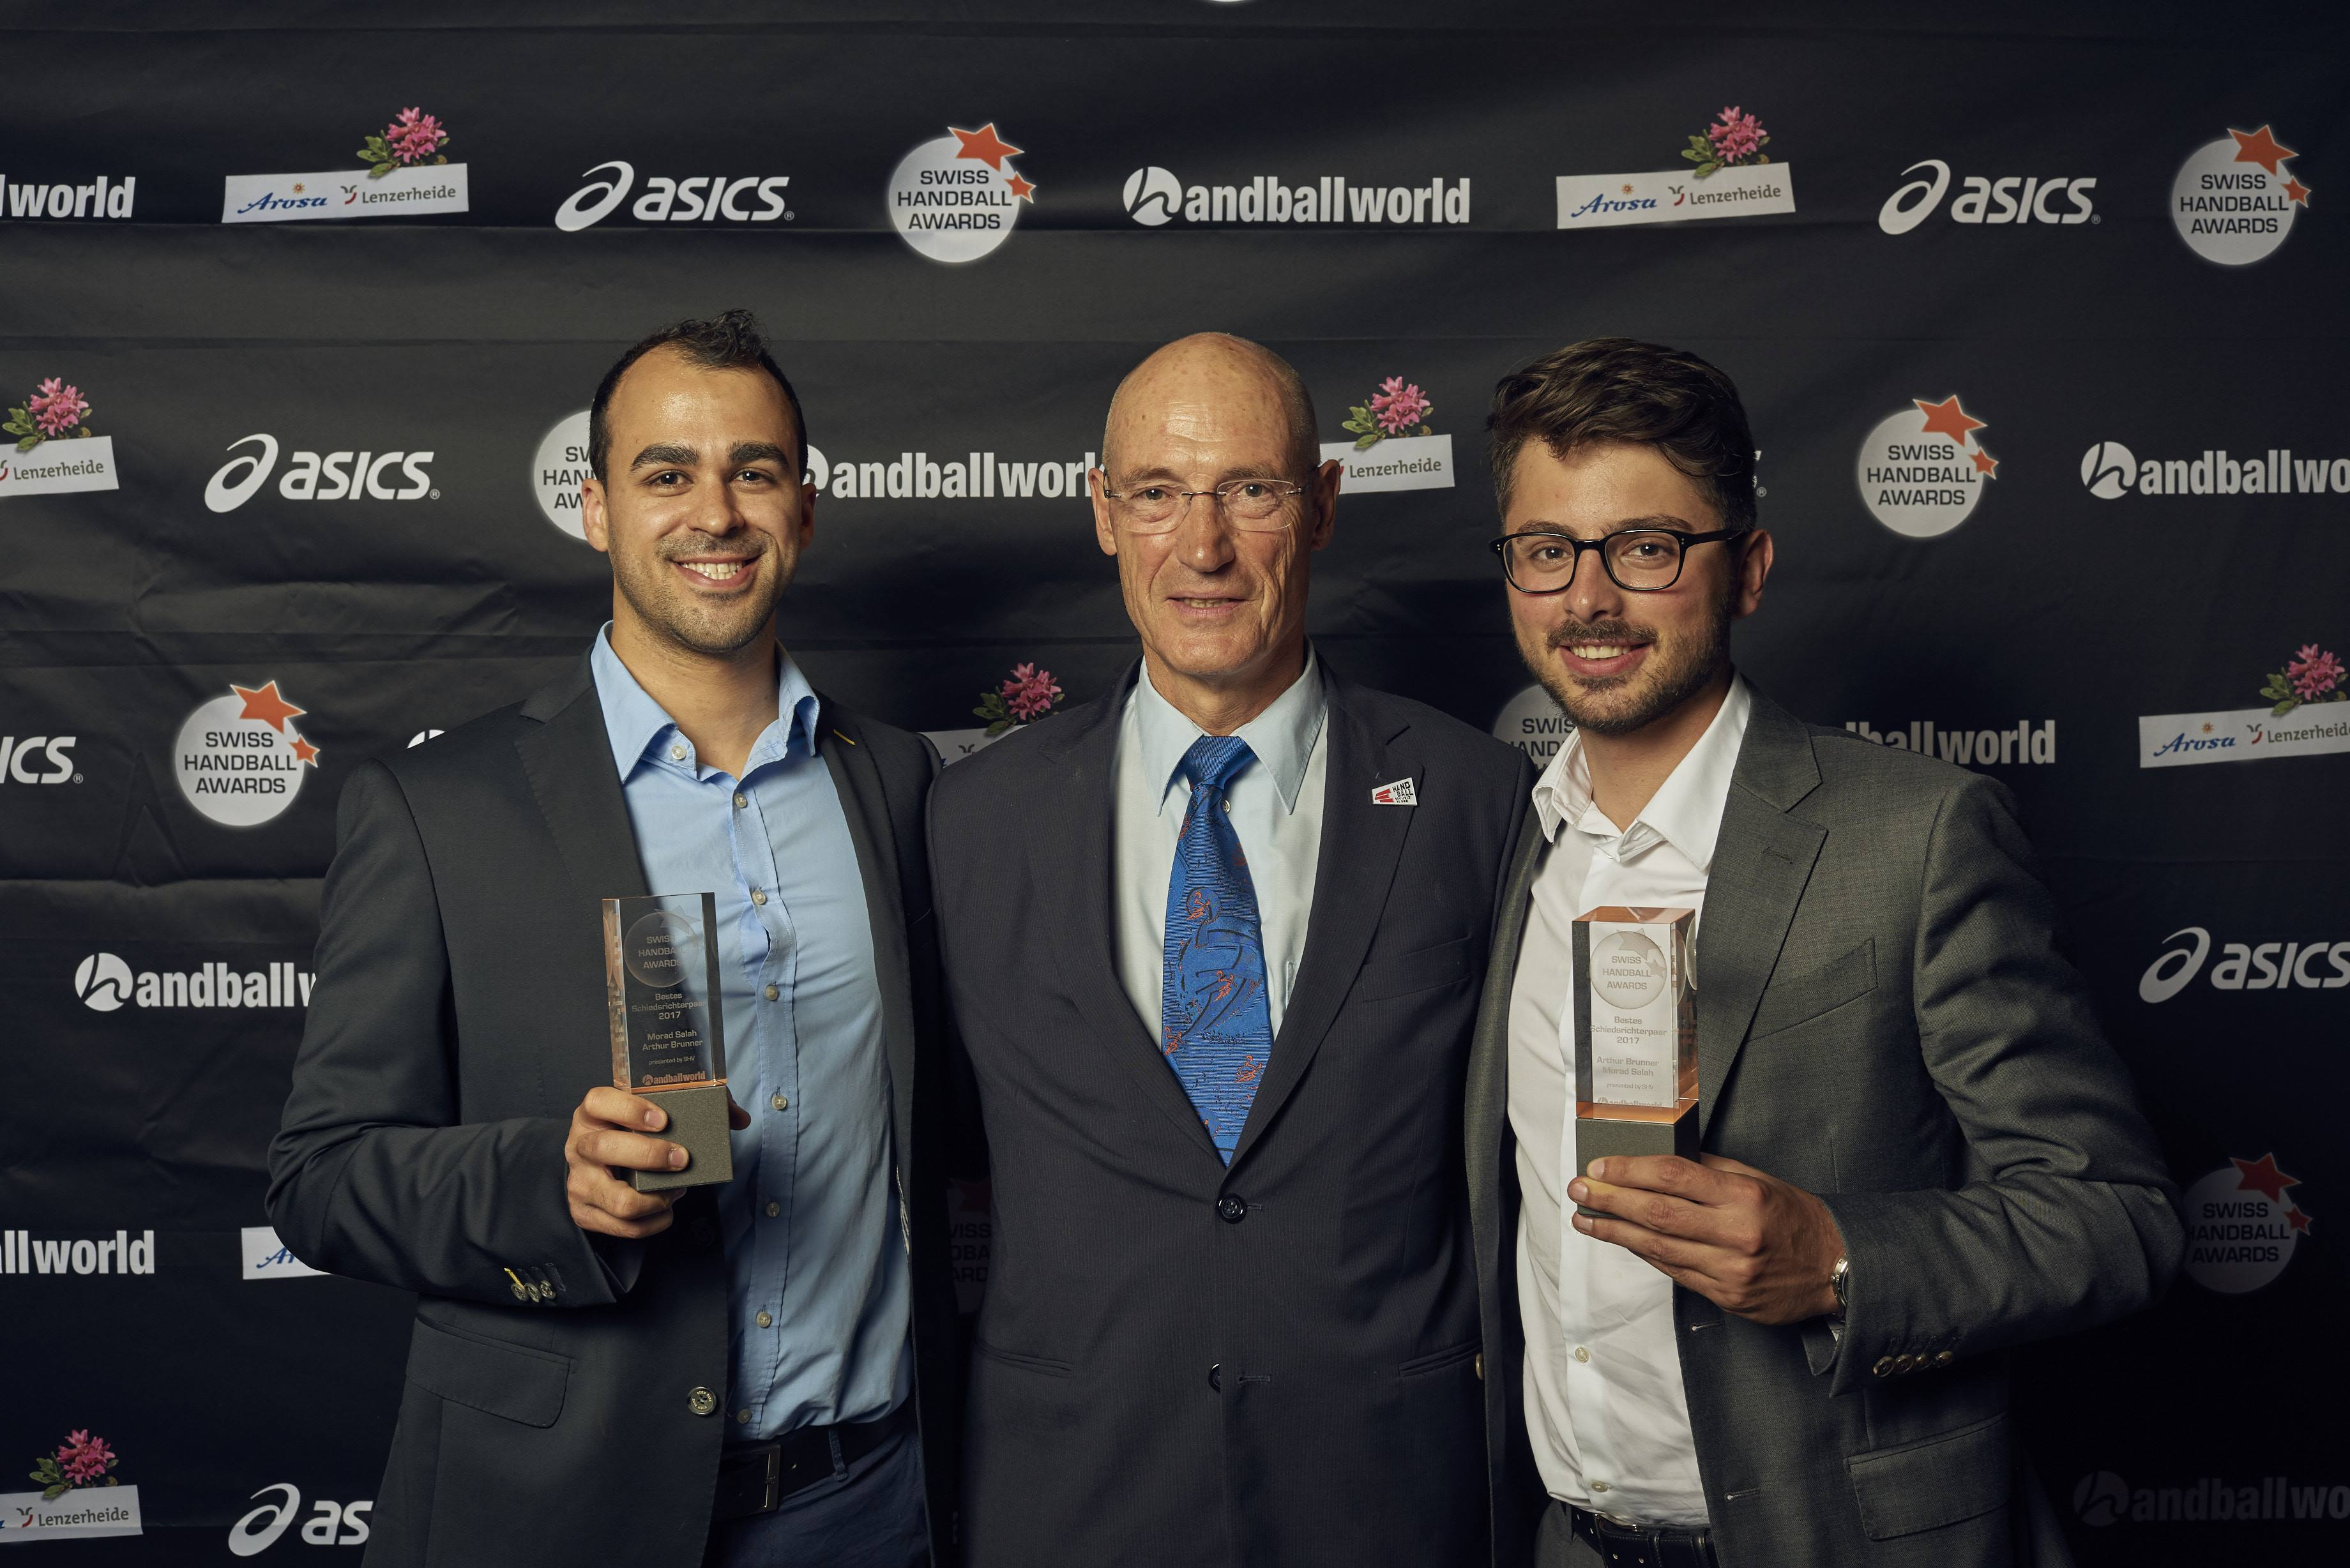 Bestes_Schiedsrichterpaar_SHA_2017